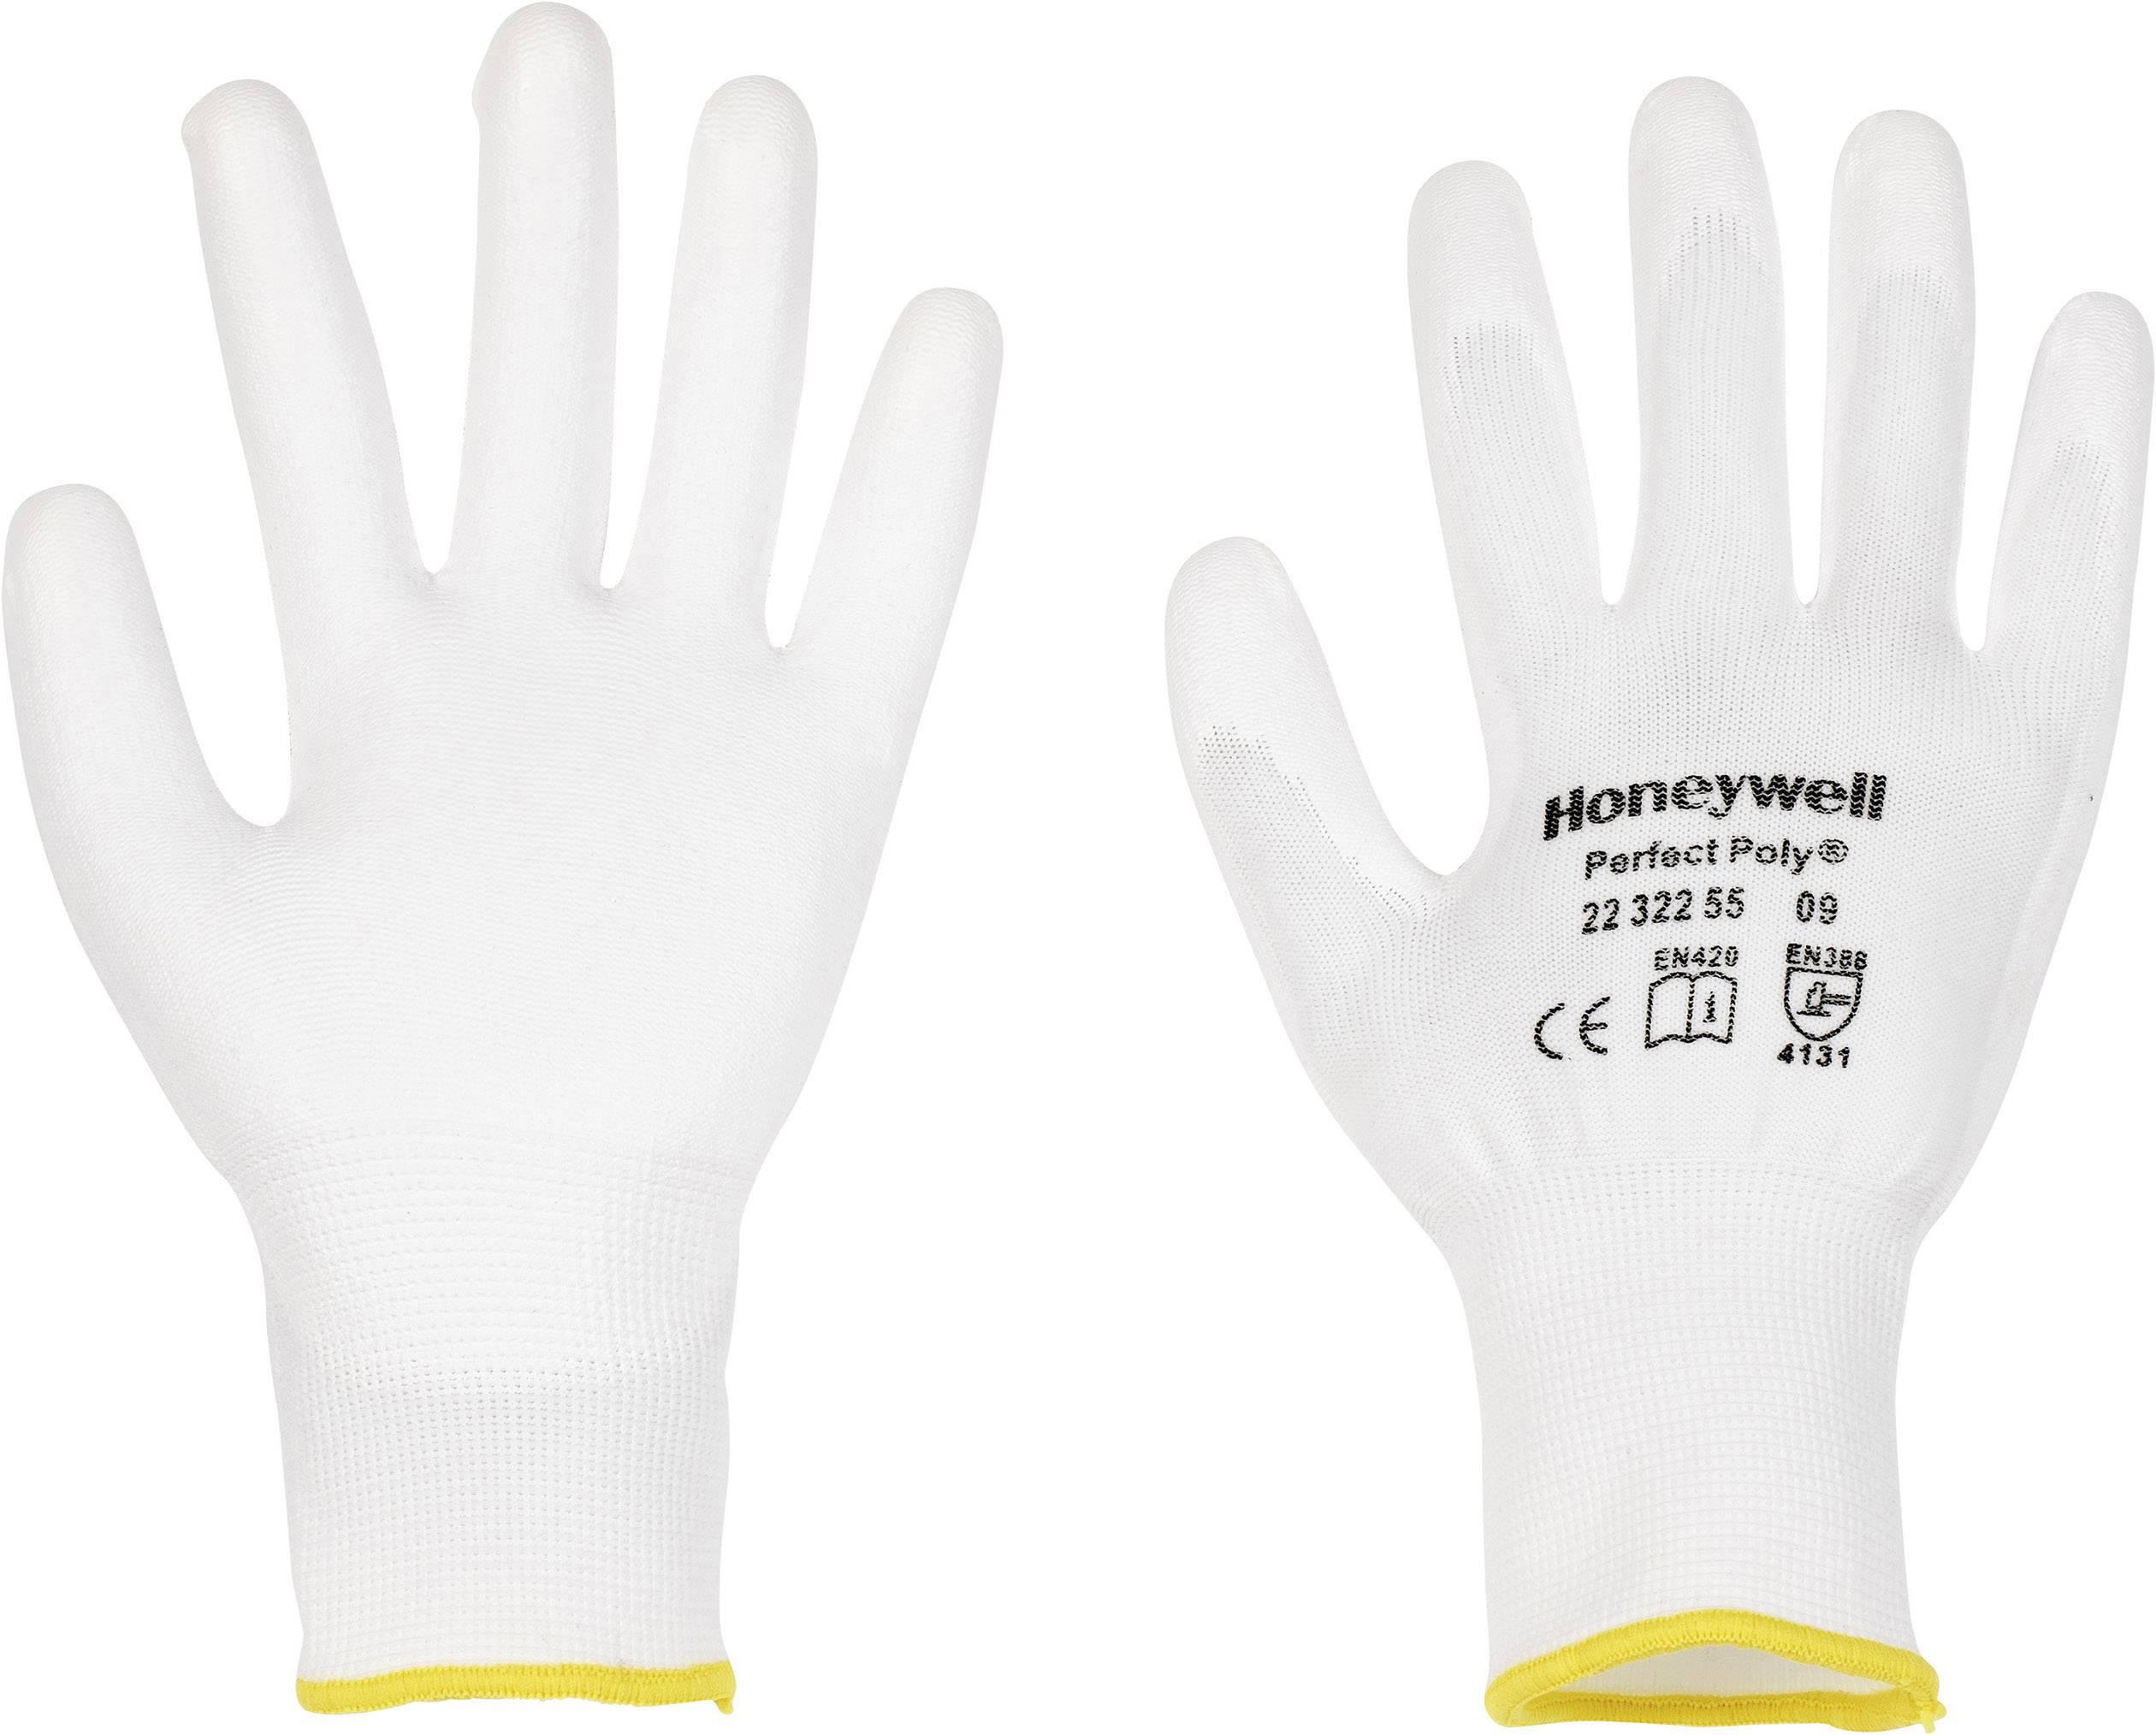 Pracovné rukavice Perfect Fit GANTS BLANCS PERFECTPOLY 2232255, velikost rukavic: 9, L